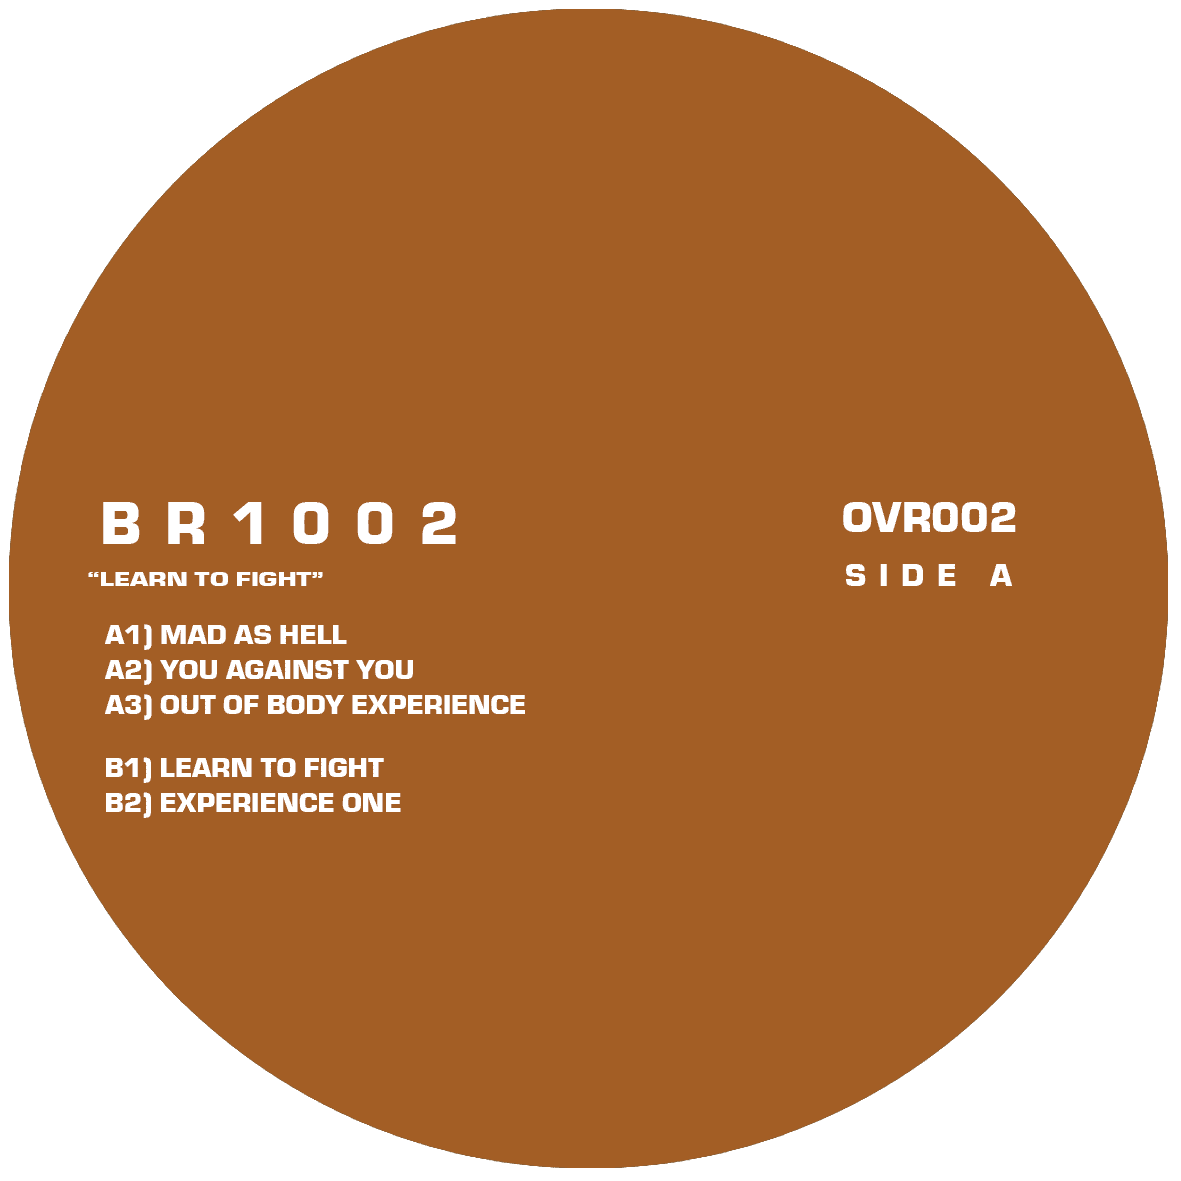 Br1002